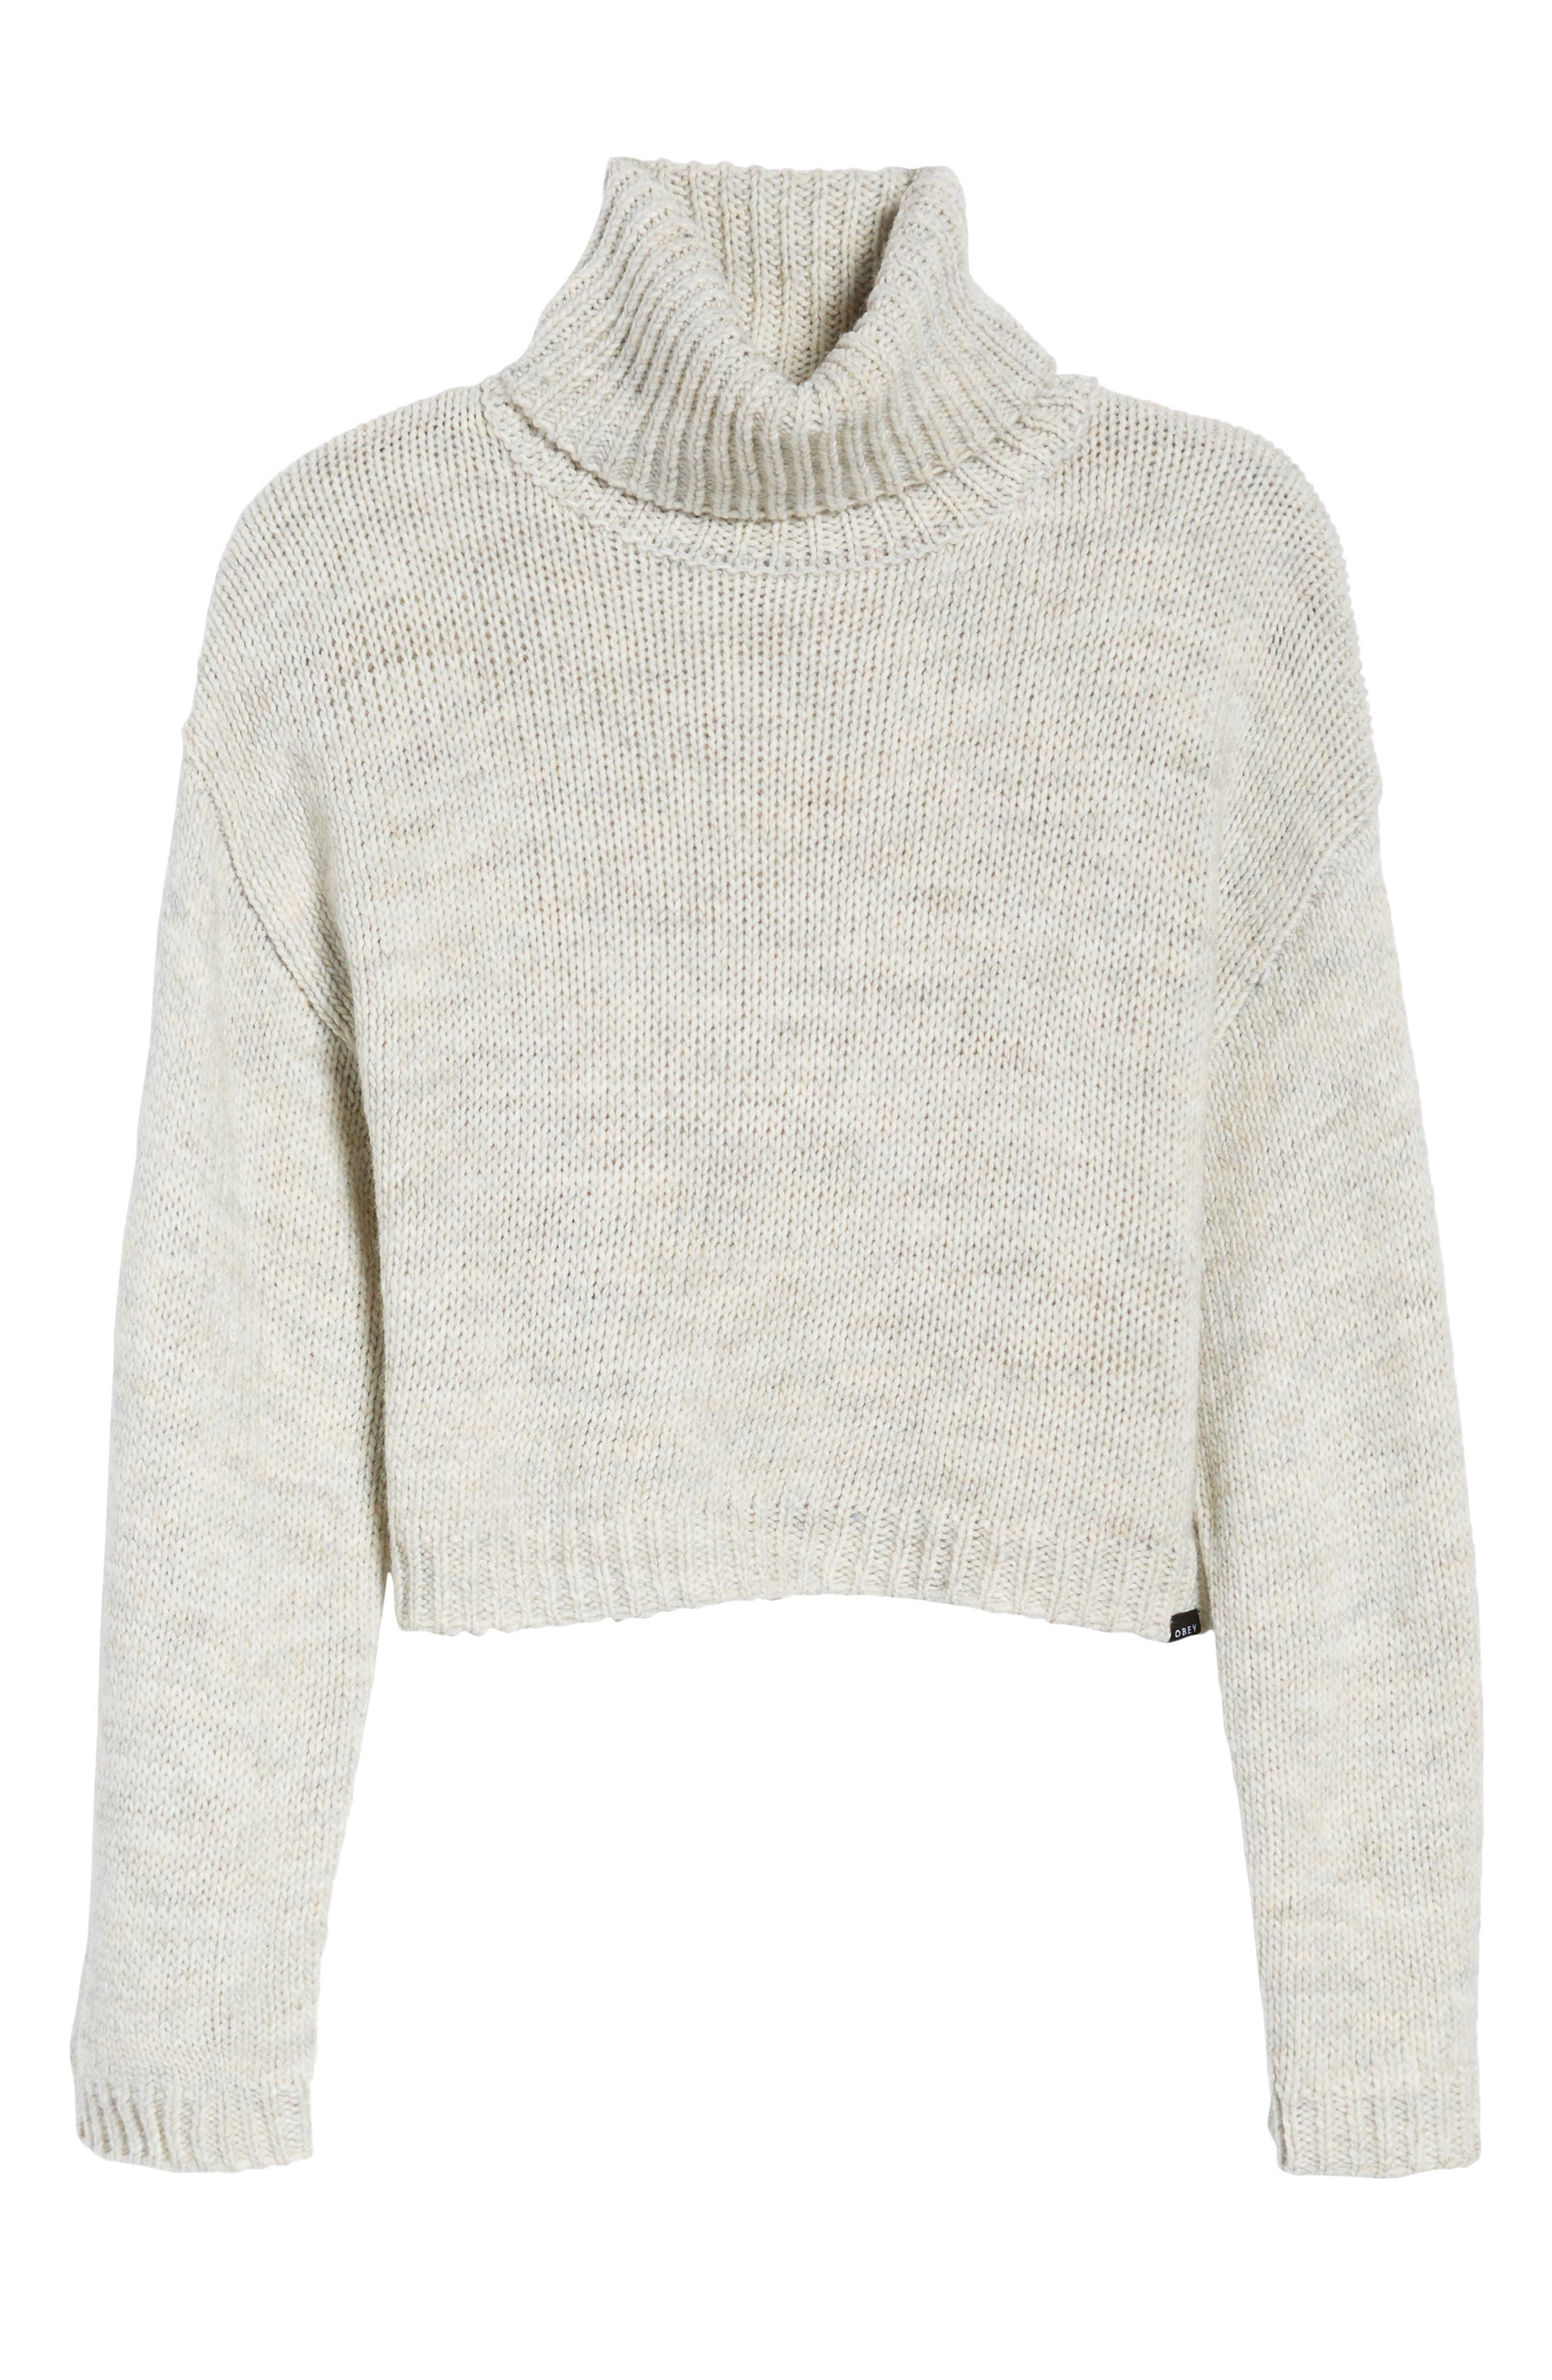 Skelter Turtleneck Sweater,                             Alternate thumbnail 6, color,                             Heather Grey